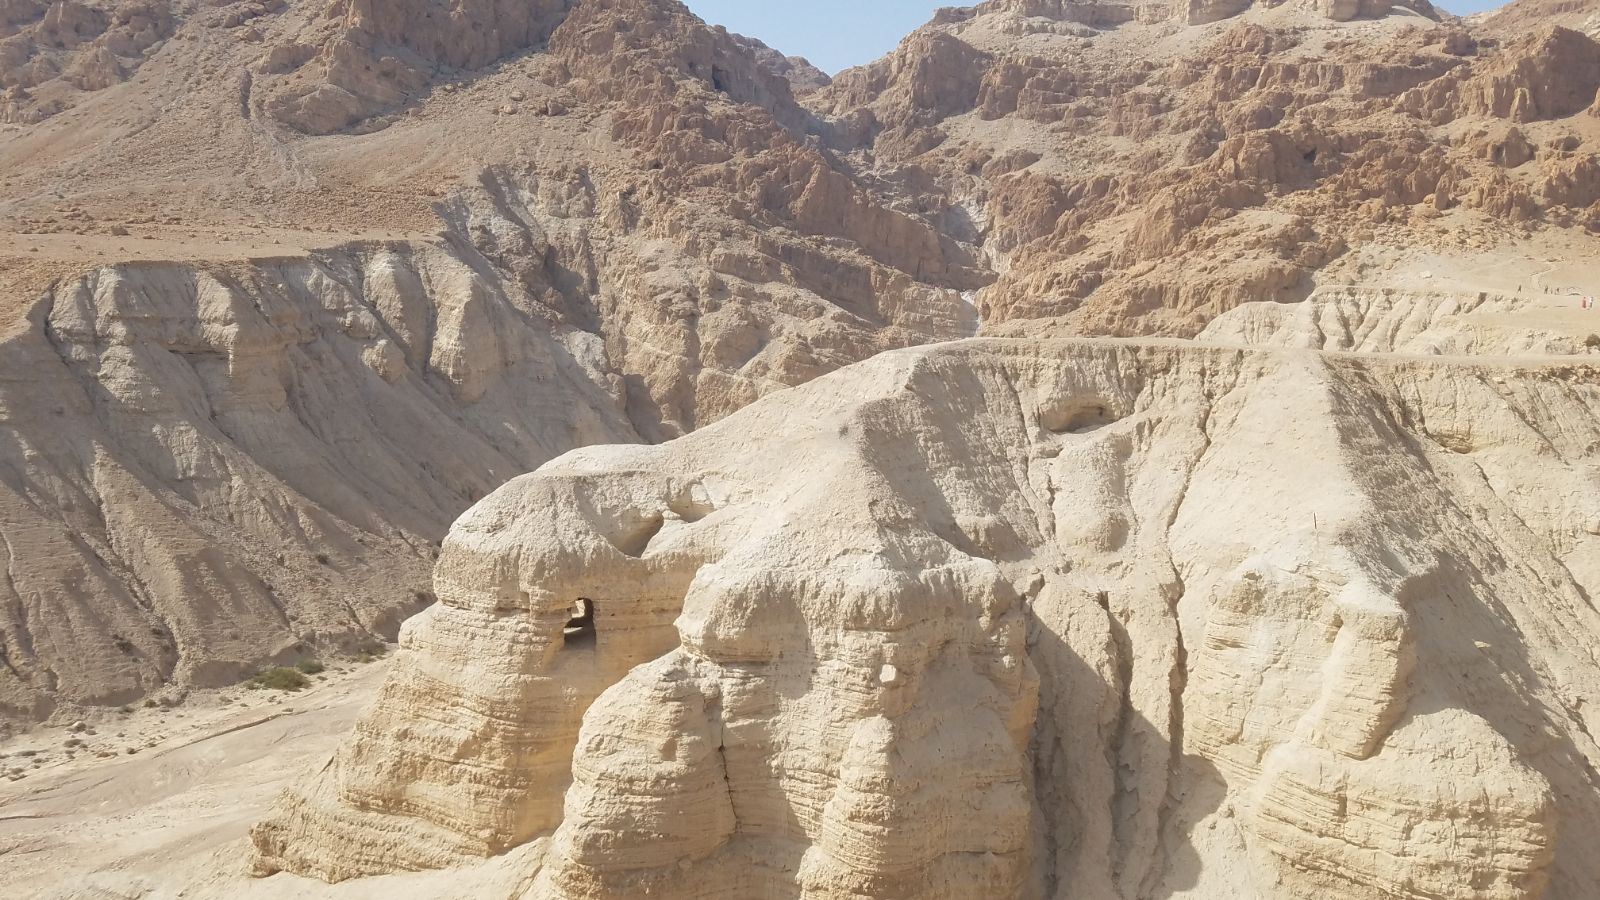 Qumran-20190126